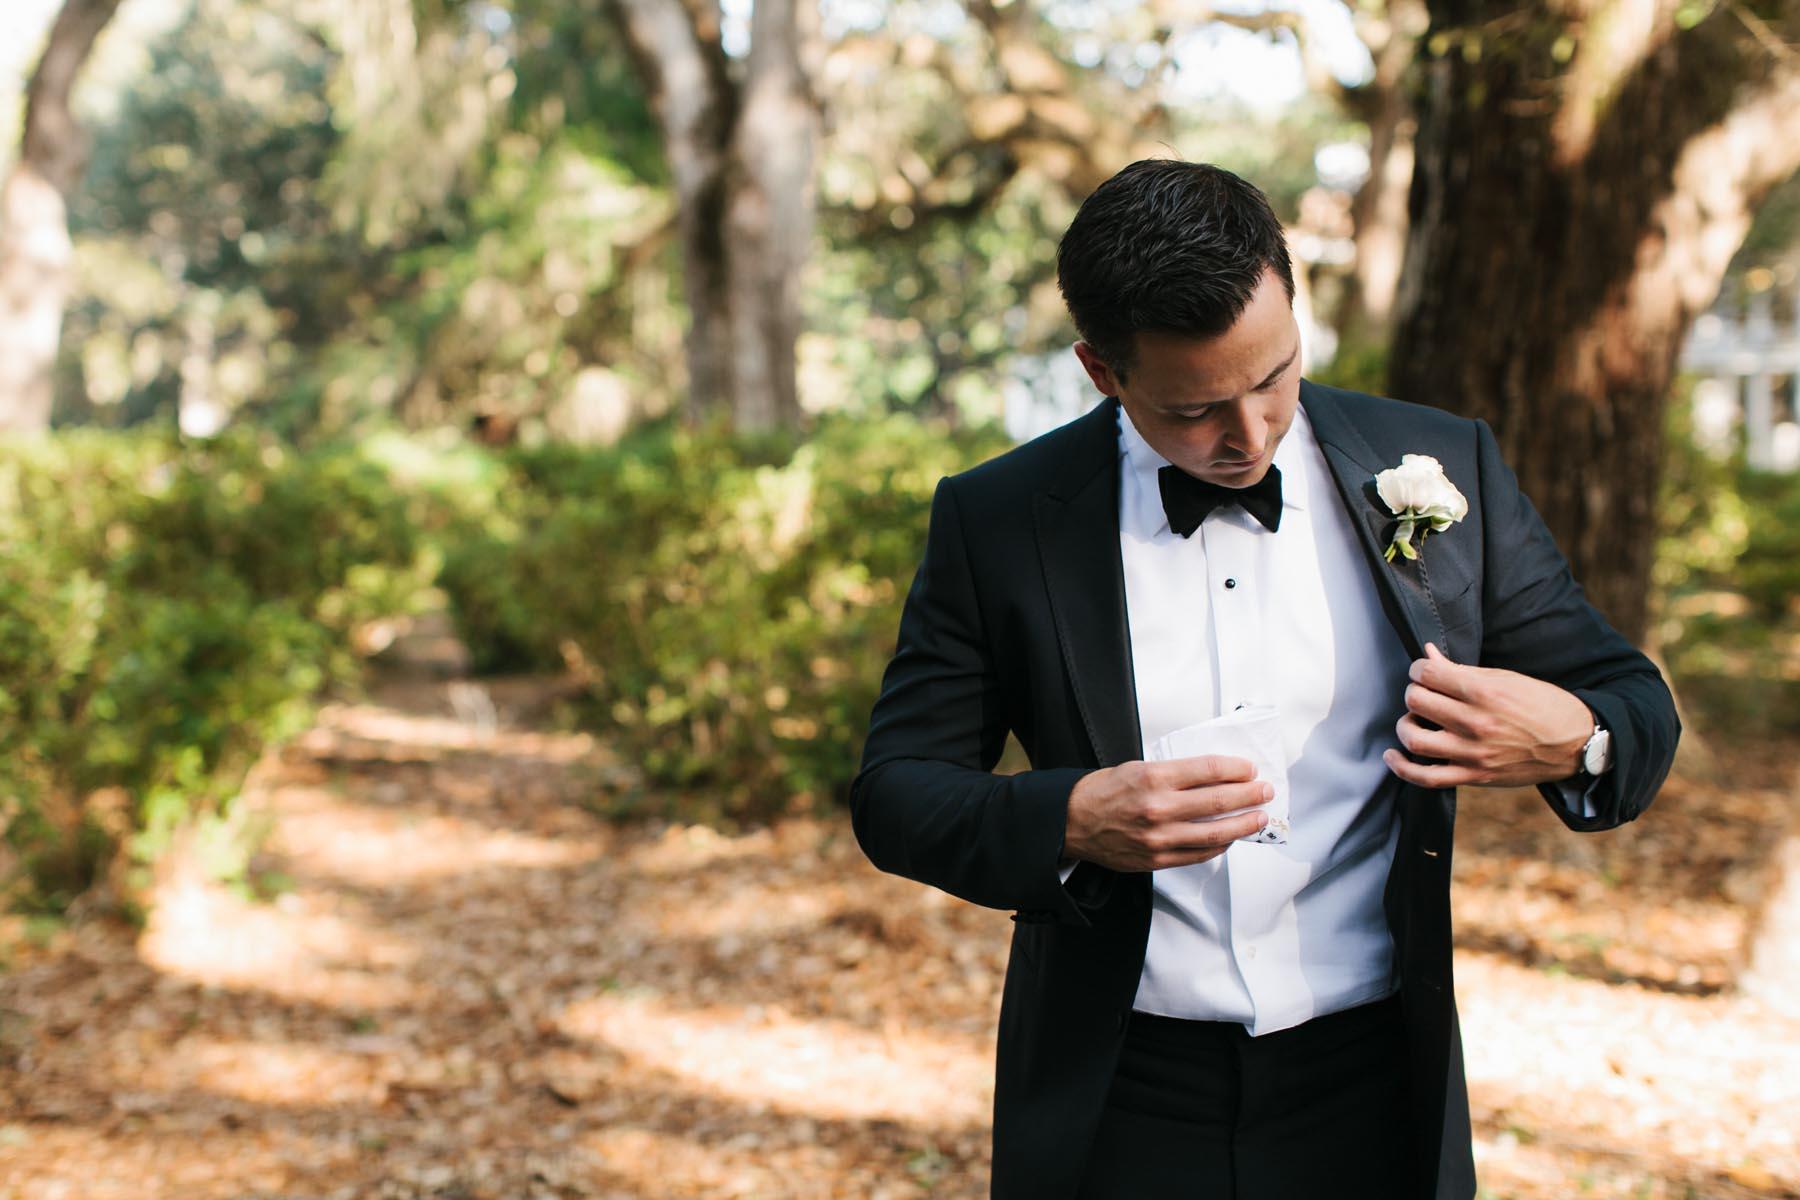 lowry wedding blog eden garden florida wedding-54